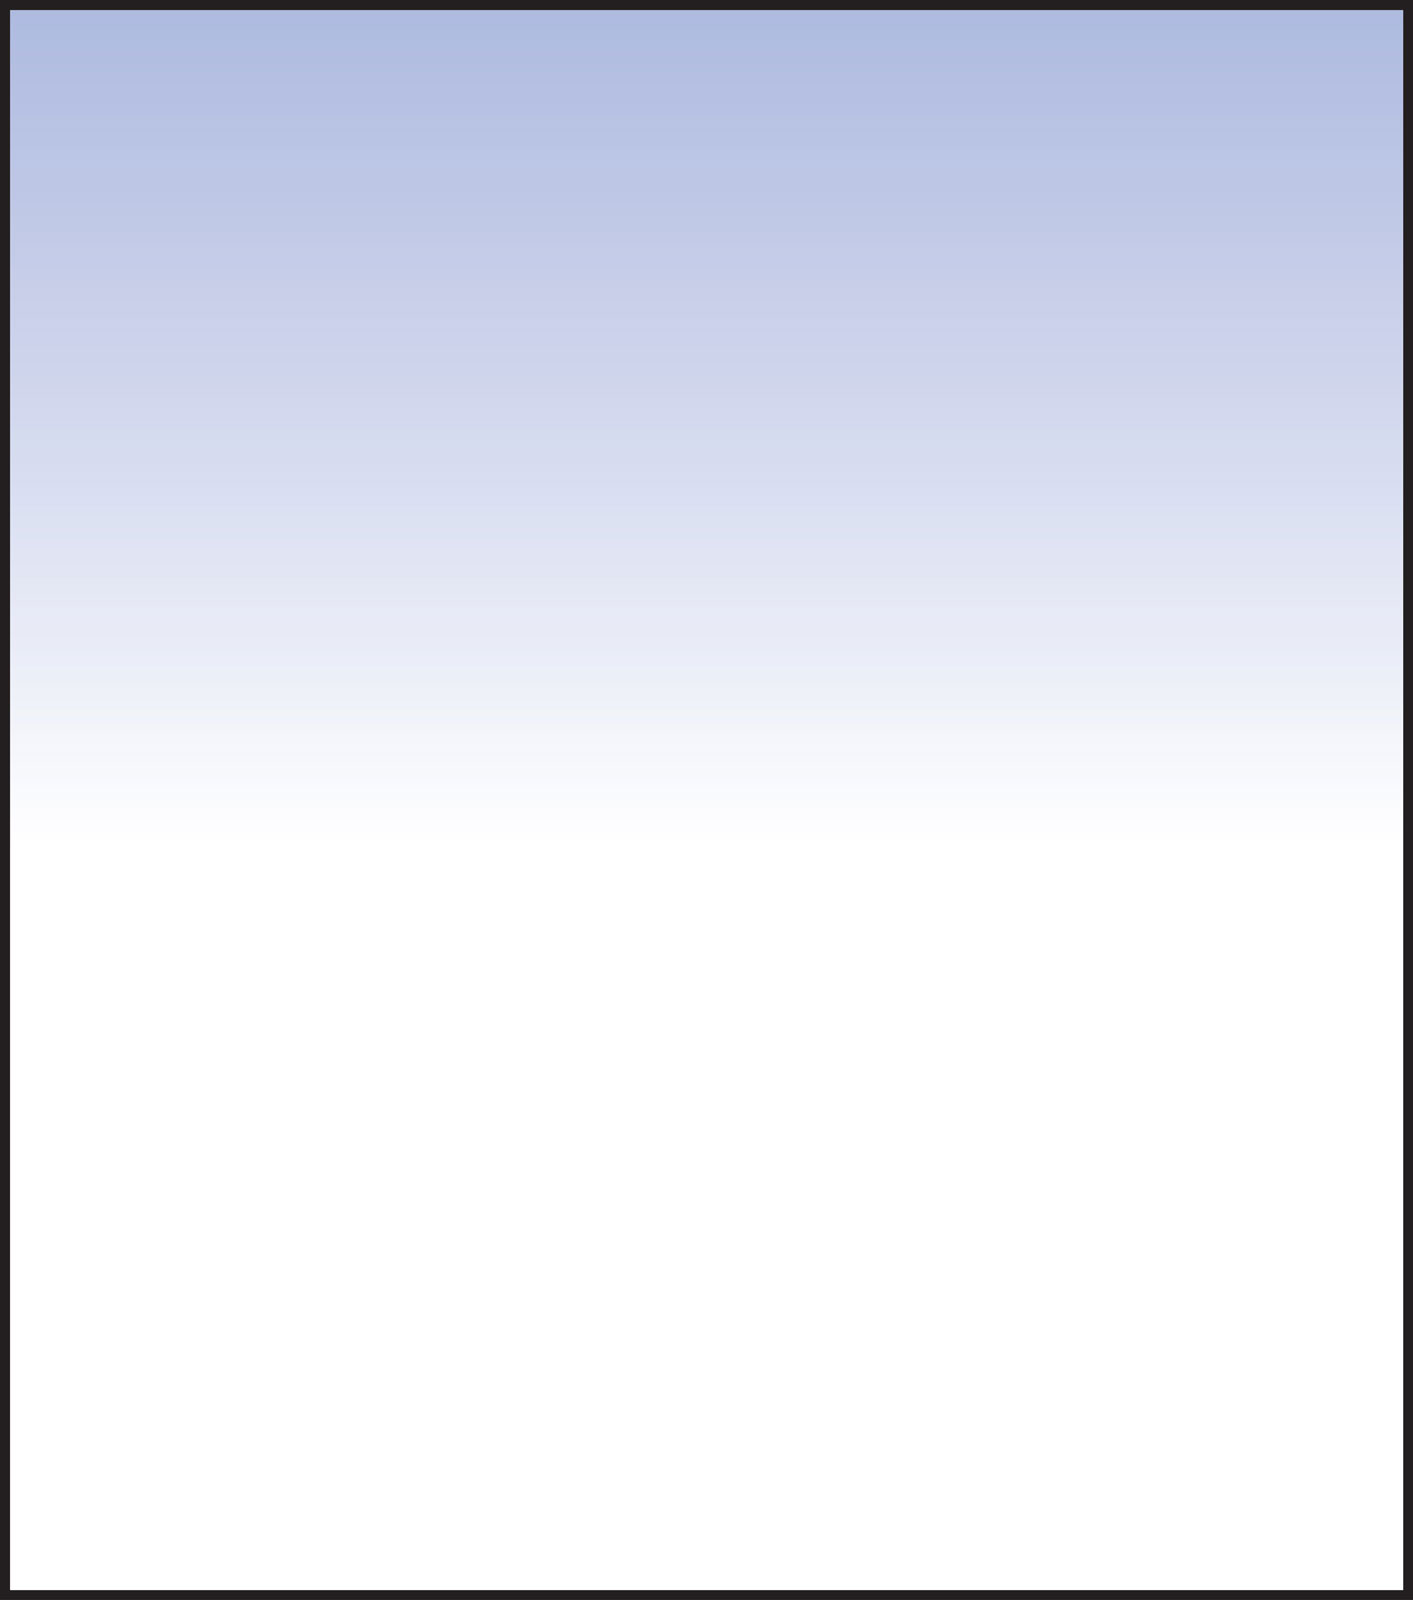 SW150-Real-Blue-1-Soft-Grad